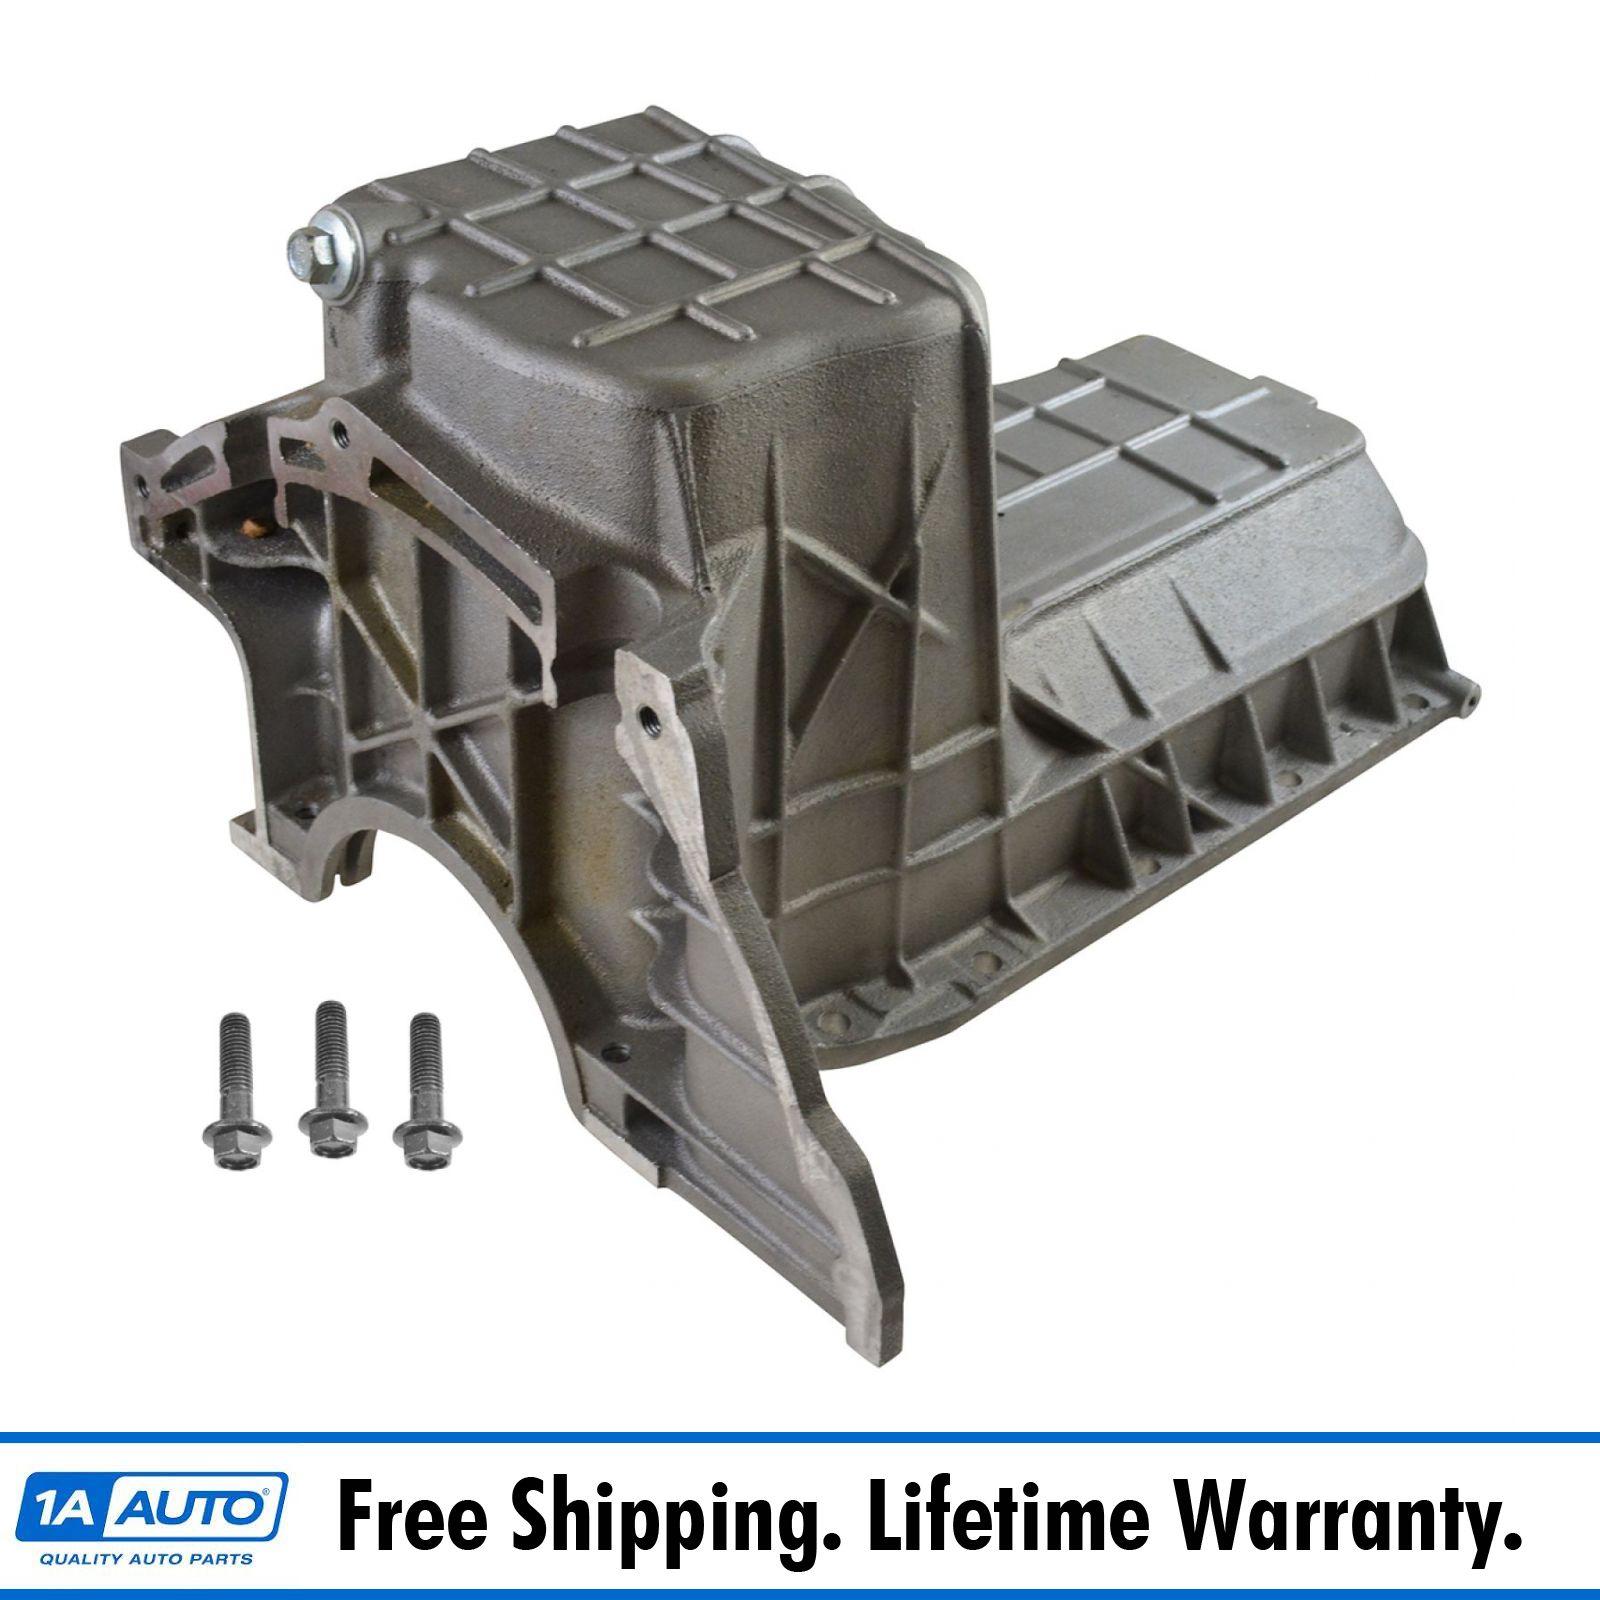 Dorman Engine Oil Pan For S10 Pickup Truck Bravada Blazer Safari Chevy Description Olds